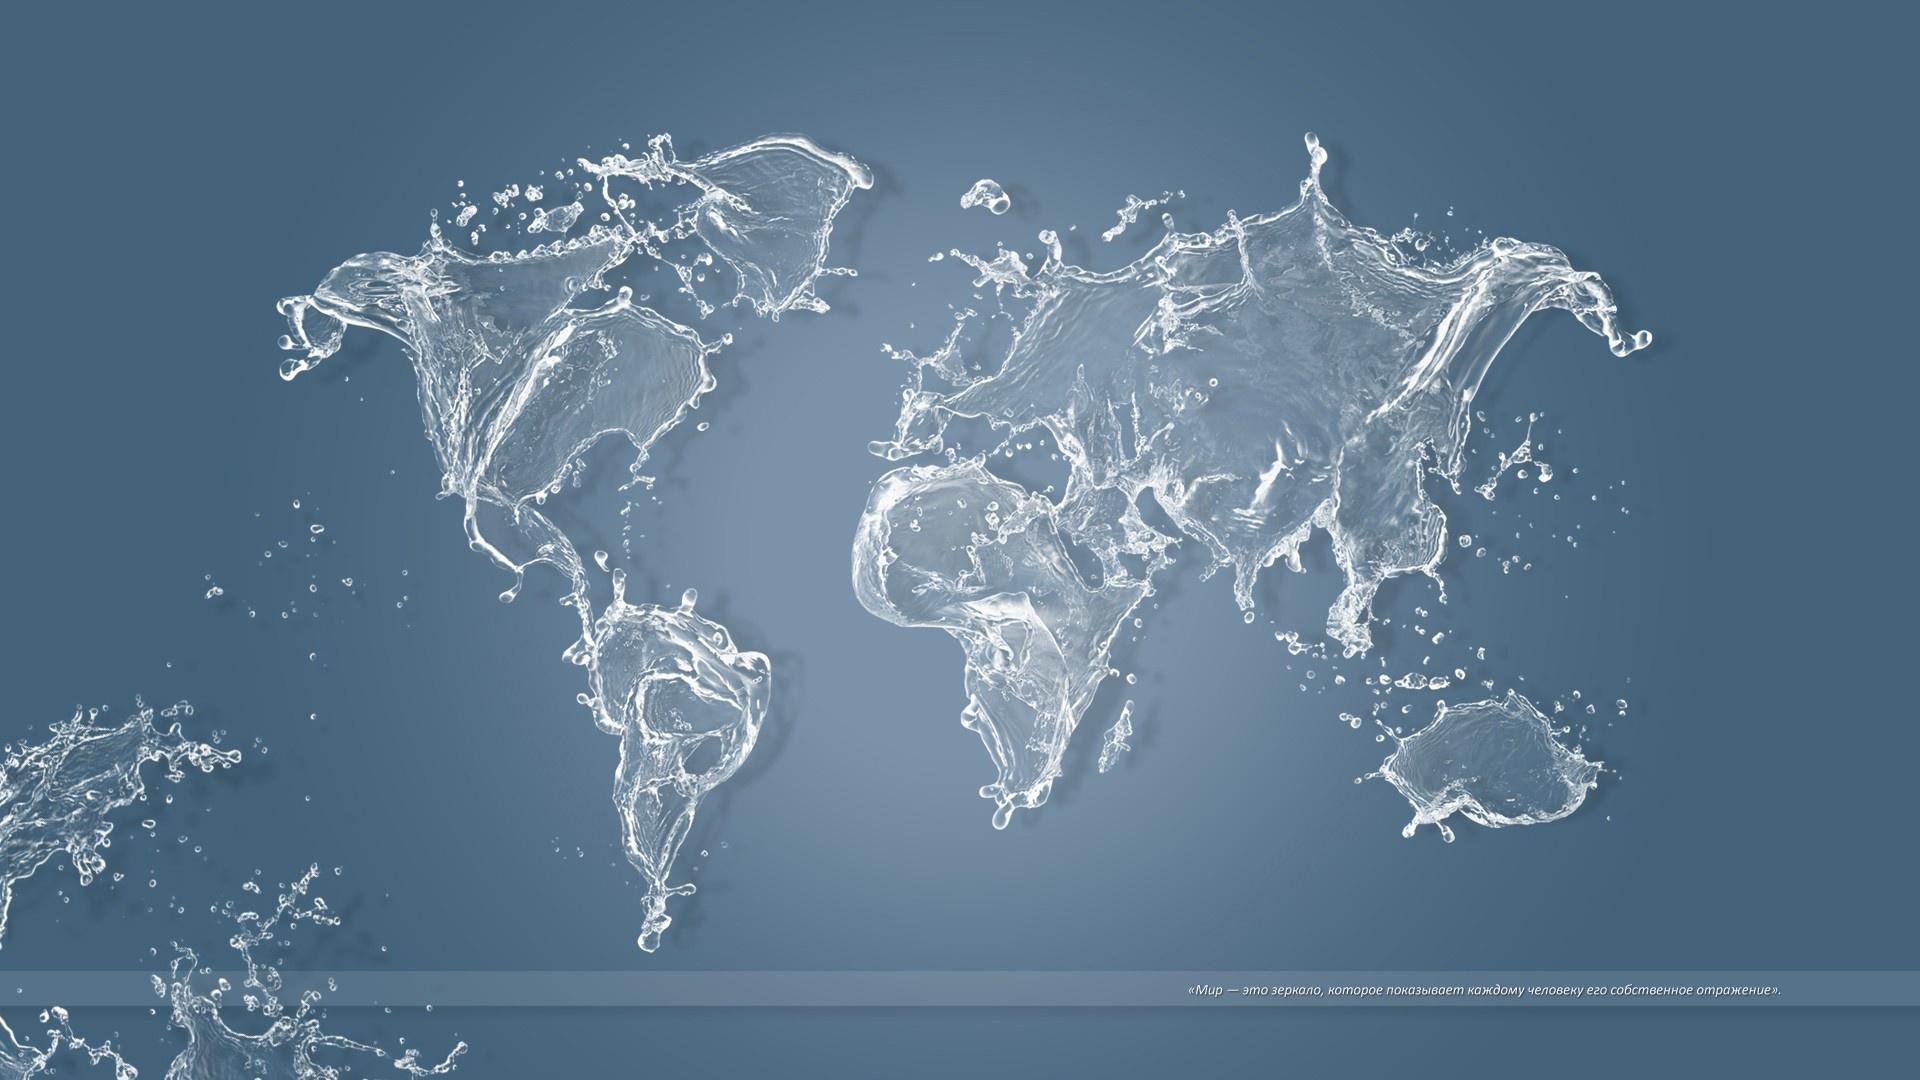 Wall map wallpaper wallpapersafari wallpaperswallpaperswater world map windows 8 gumiabroncs Image collections